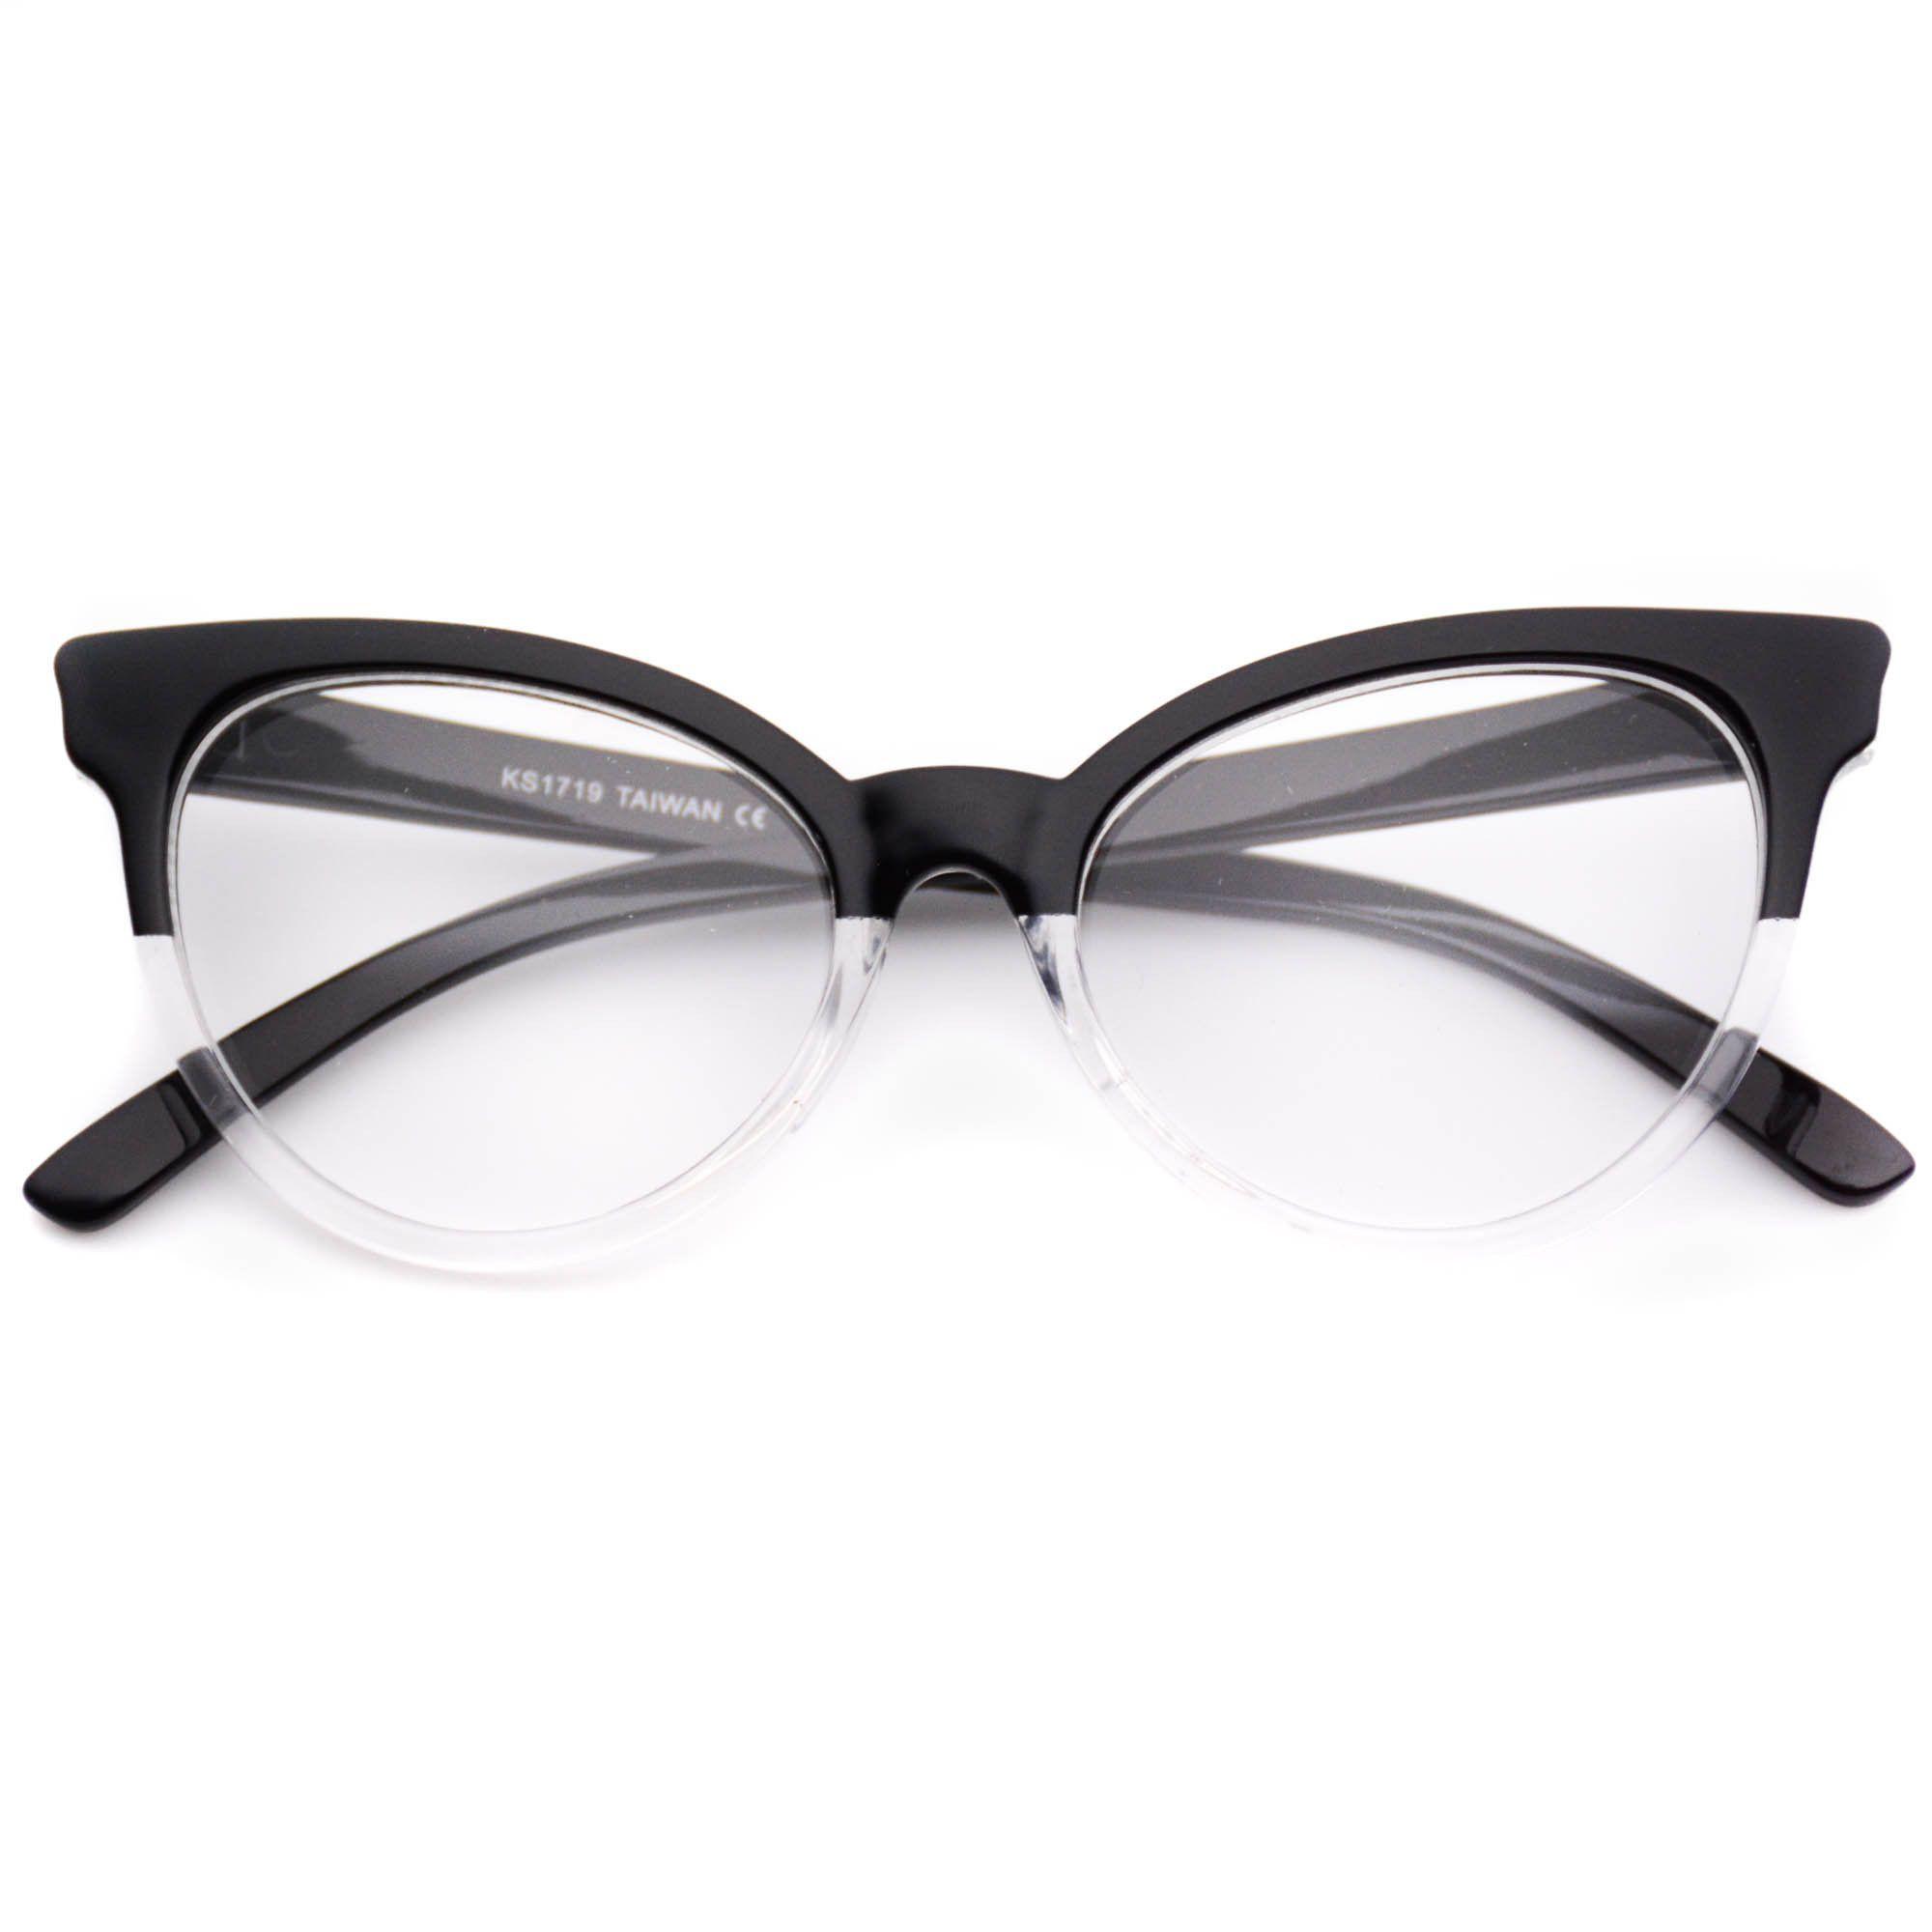 8567cb24c1c9 Black Cat Eye Sunglasses Amazon – Southern California Weather Force